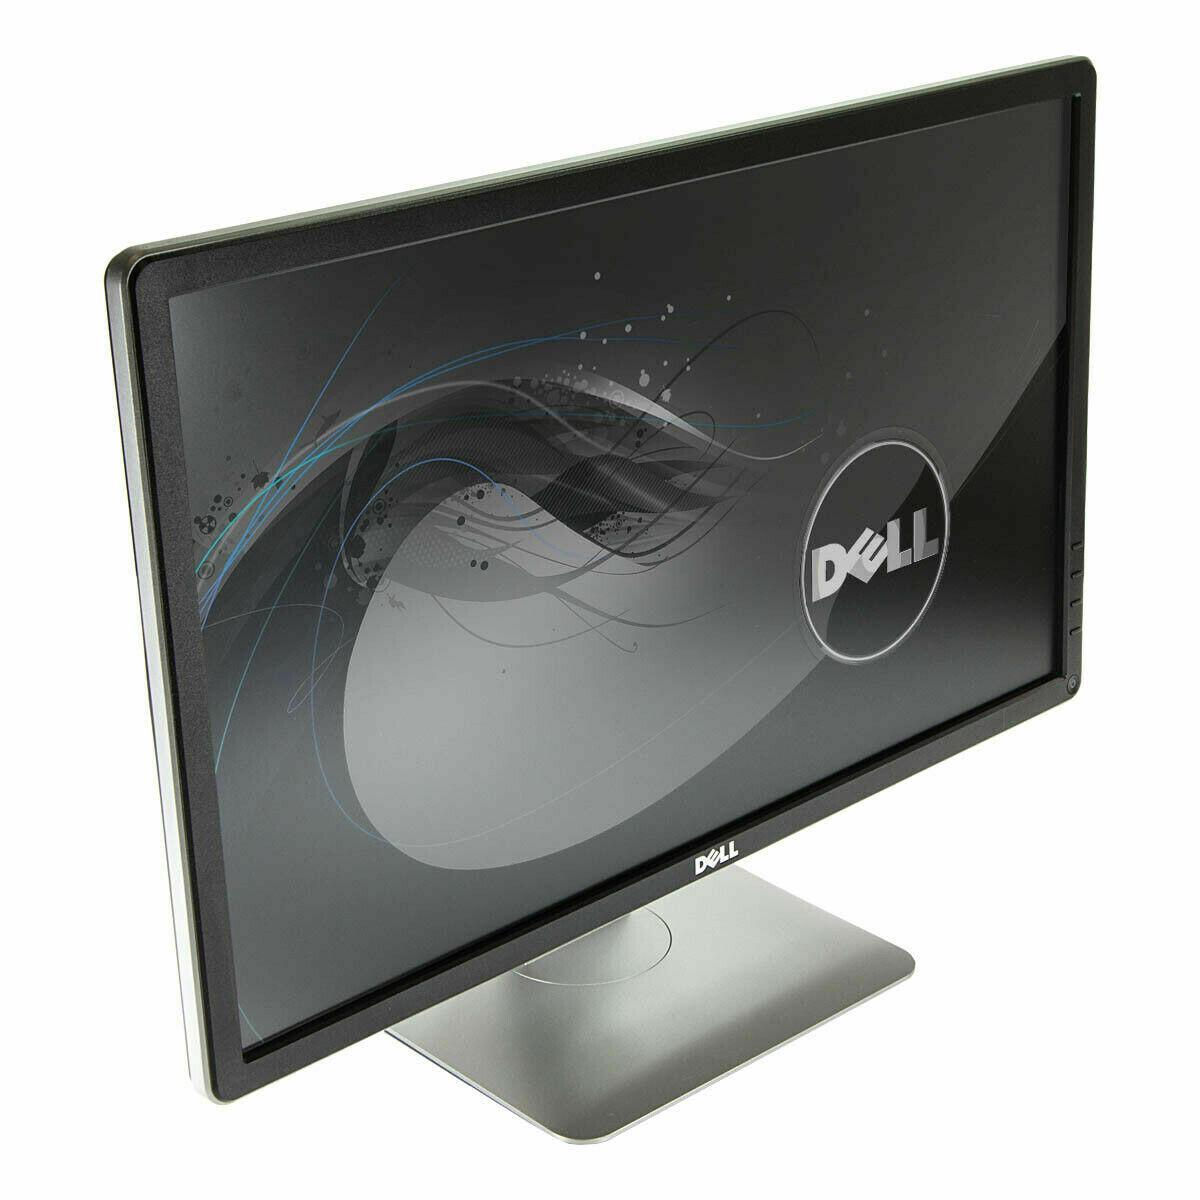 "Dell P2414H 24"" IPS Monitor Height Pivot Tilt Swivel Adjustable (Display, VGA & DVI Ports)"